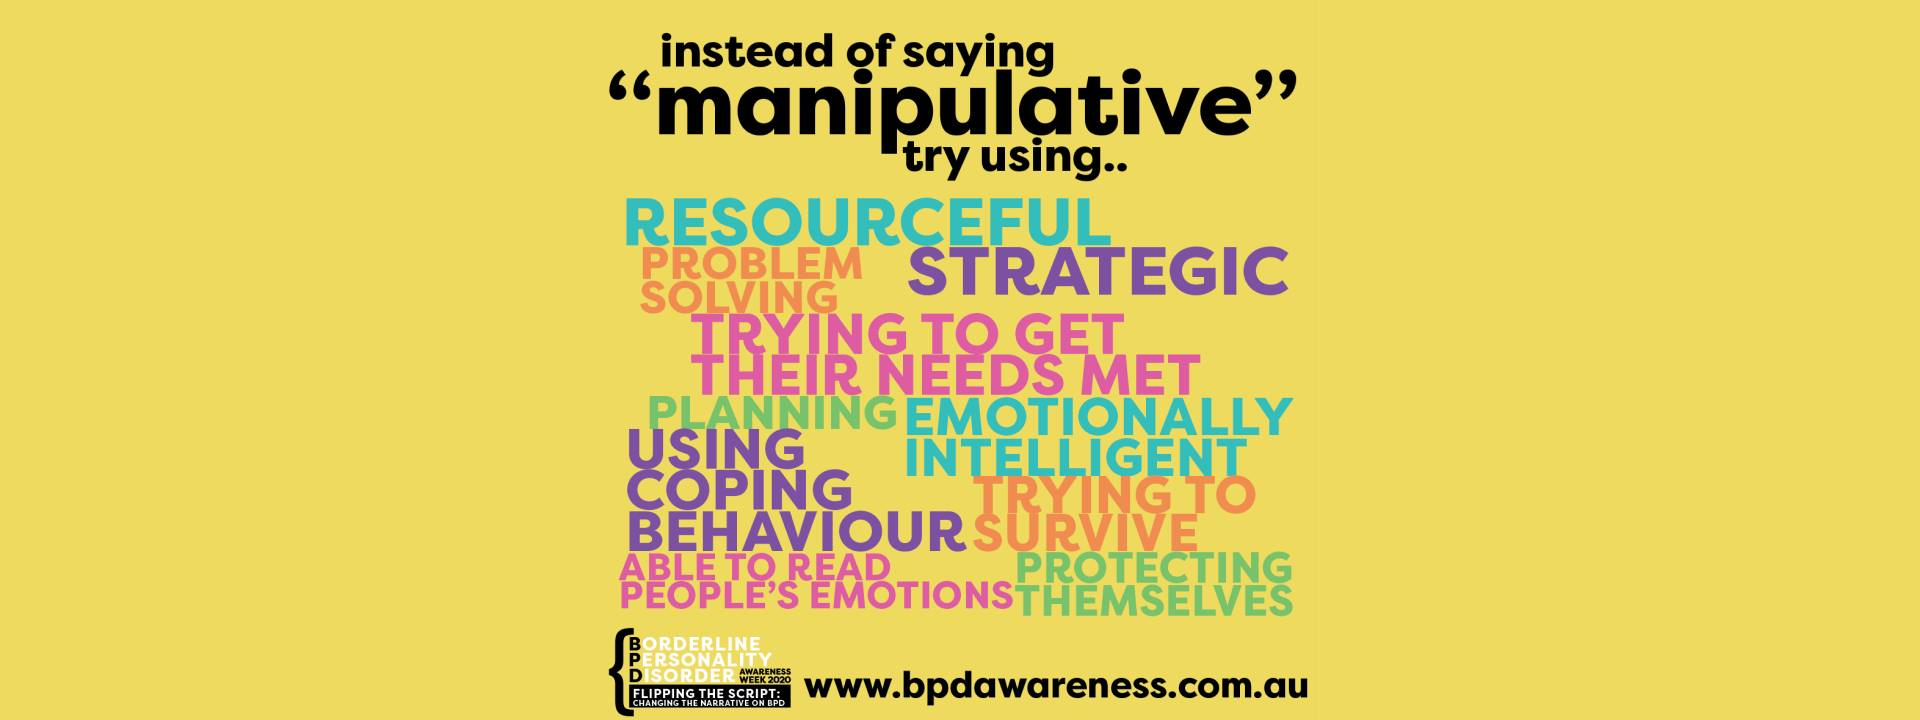 BPD Awareness Week - Not Manipulative